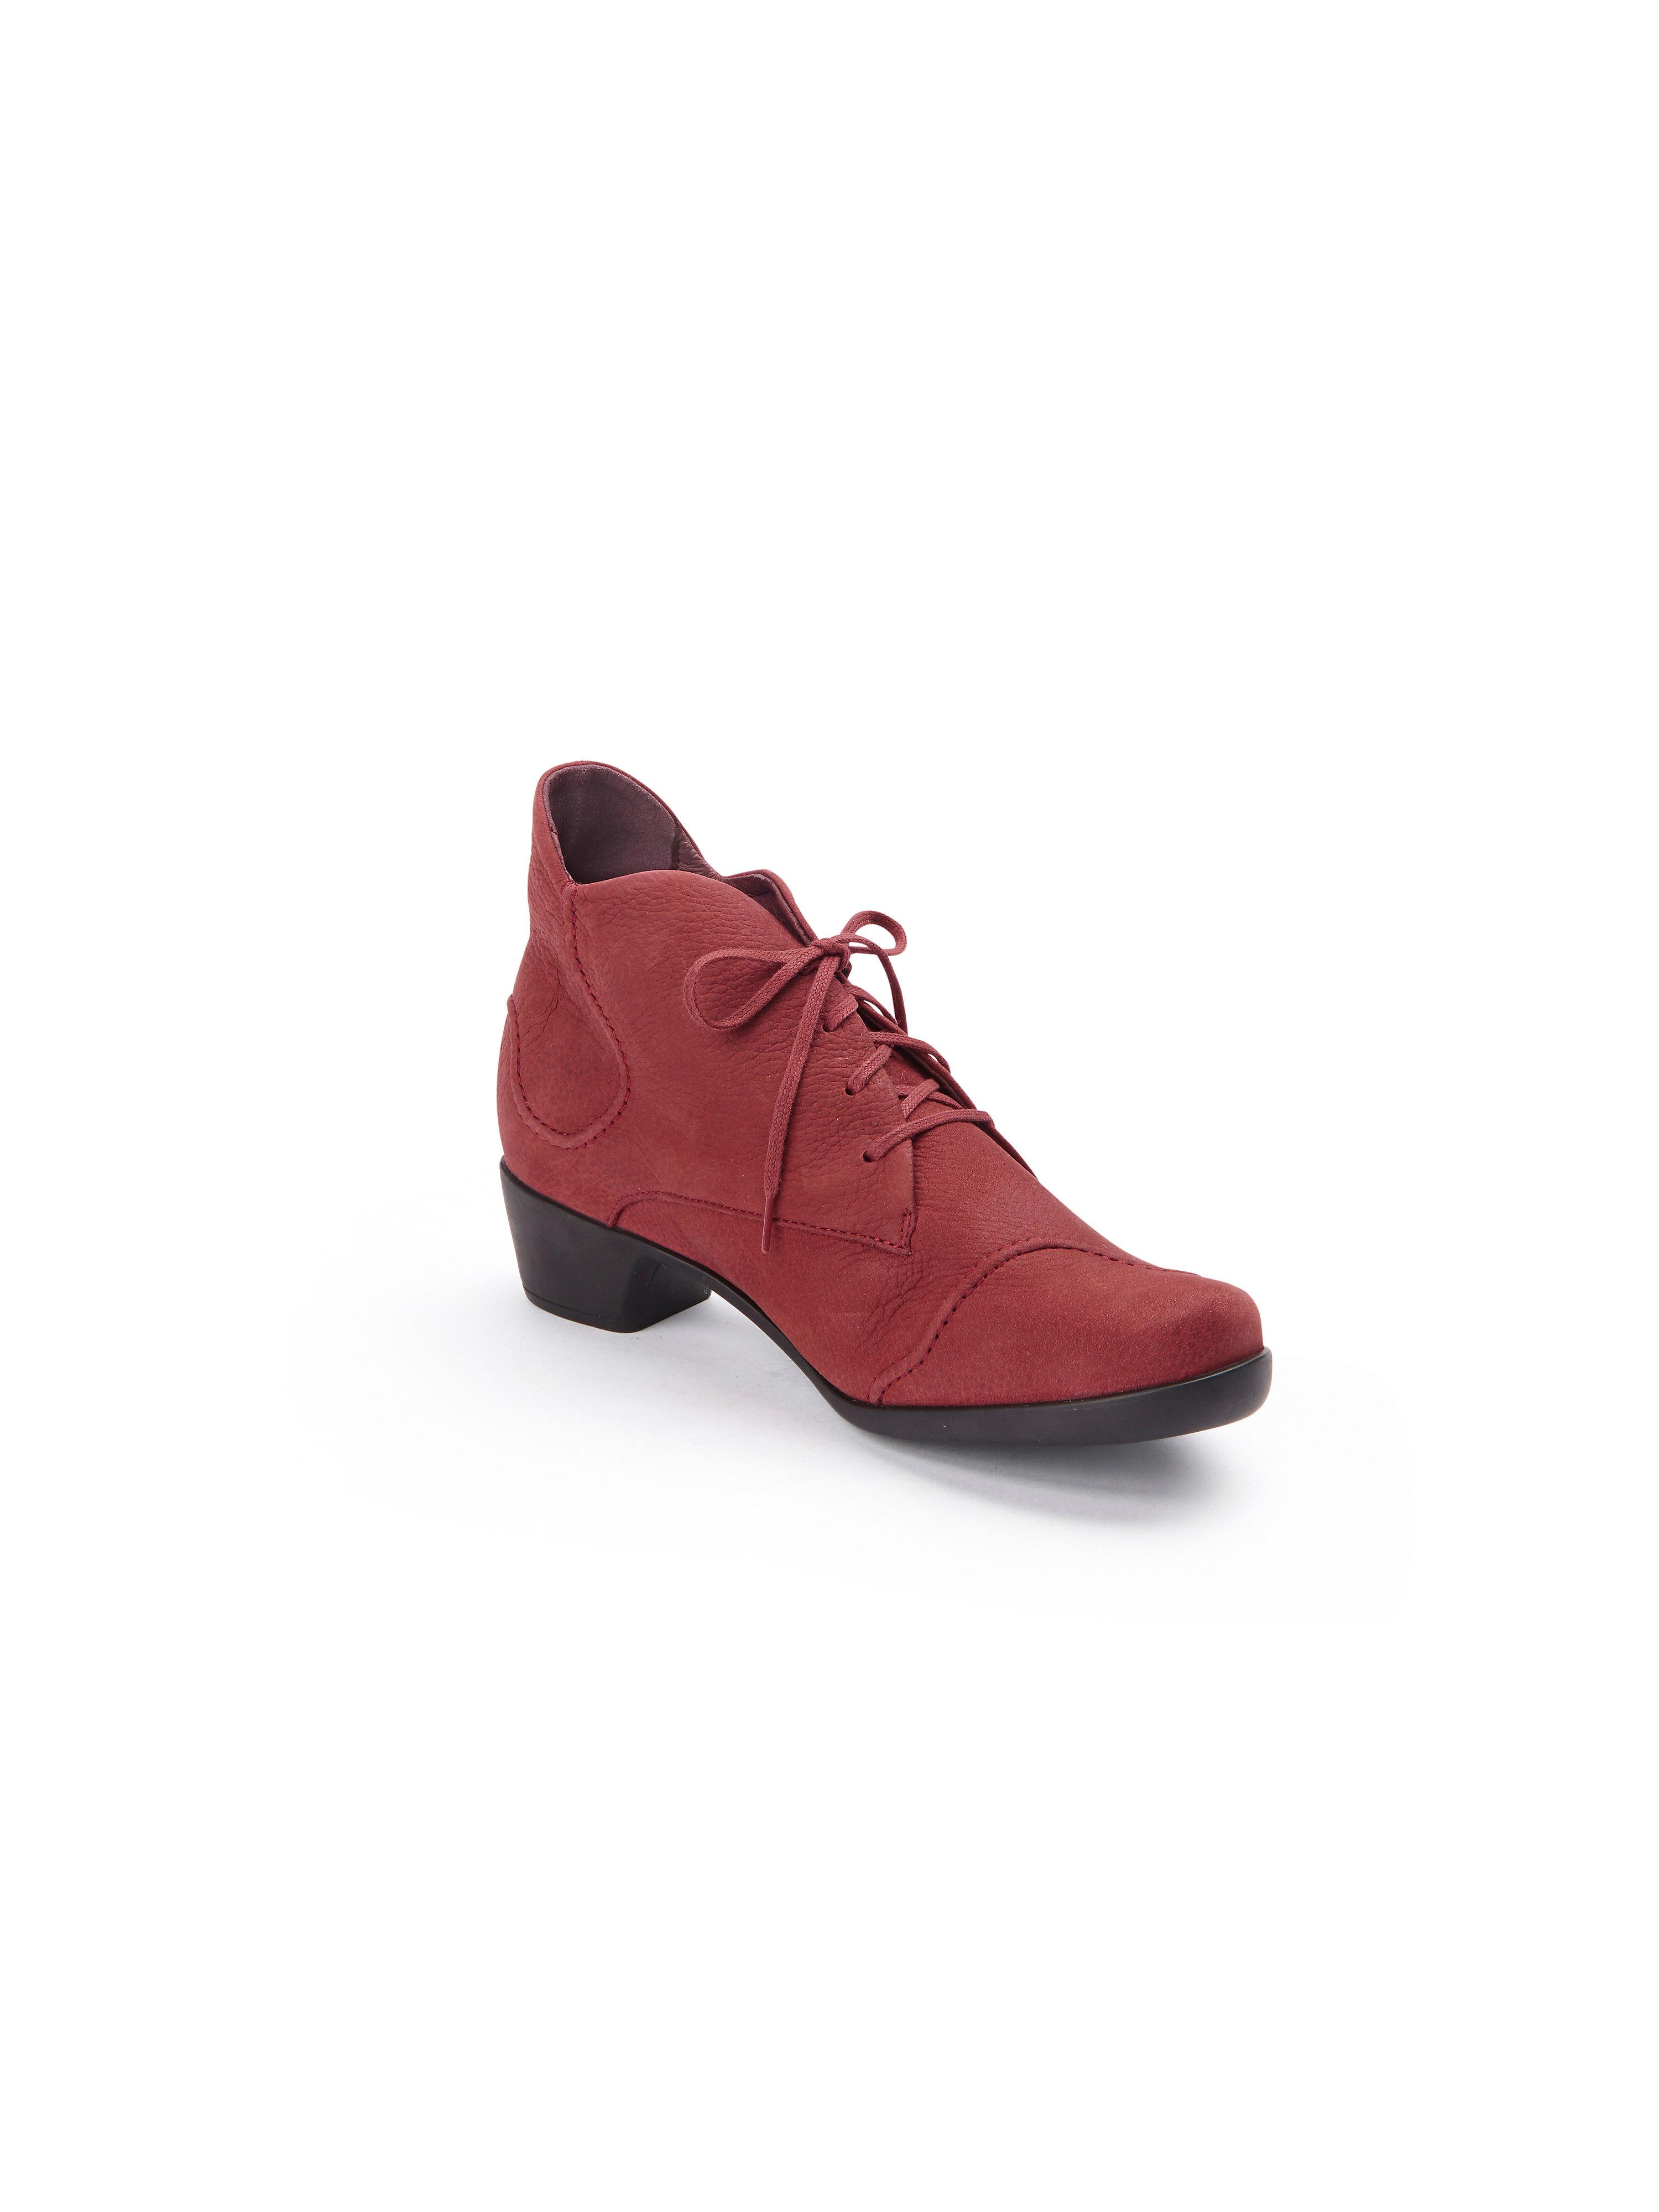 Loints Of Holland - Ankle-Boot - Rot Gute Qualität beliebte Schuhe